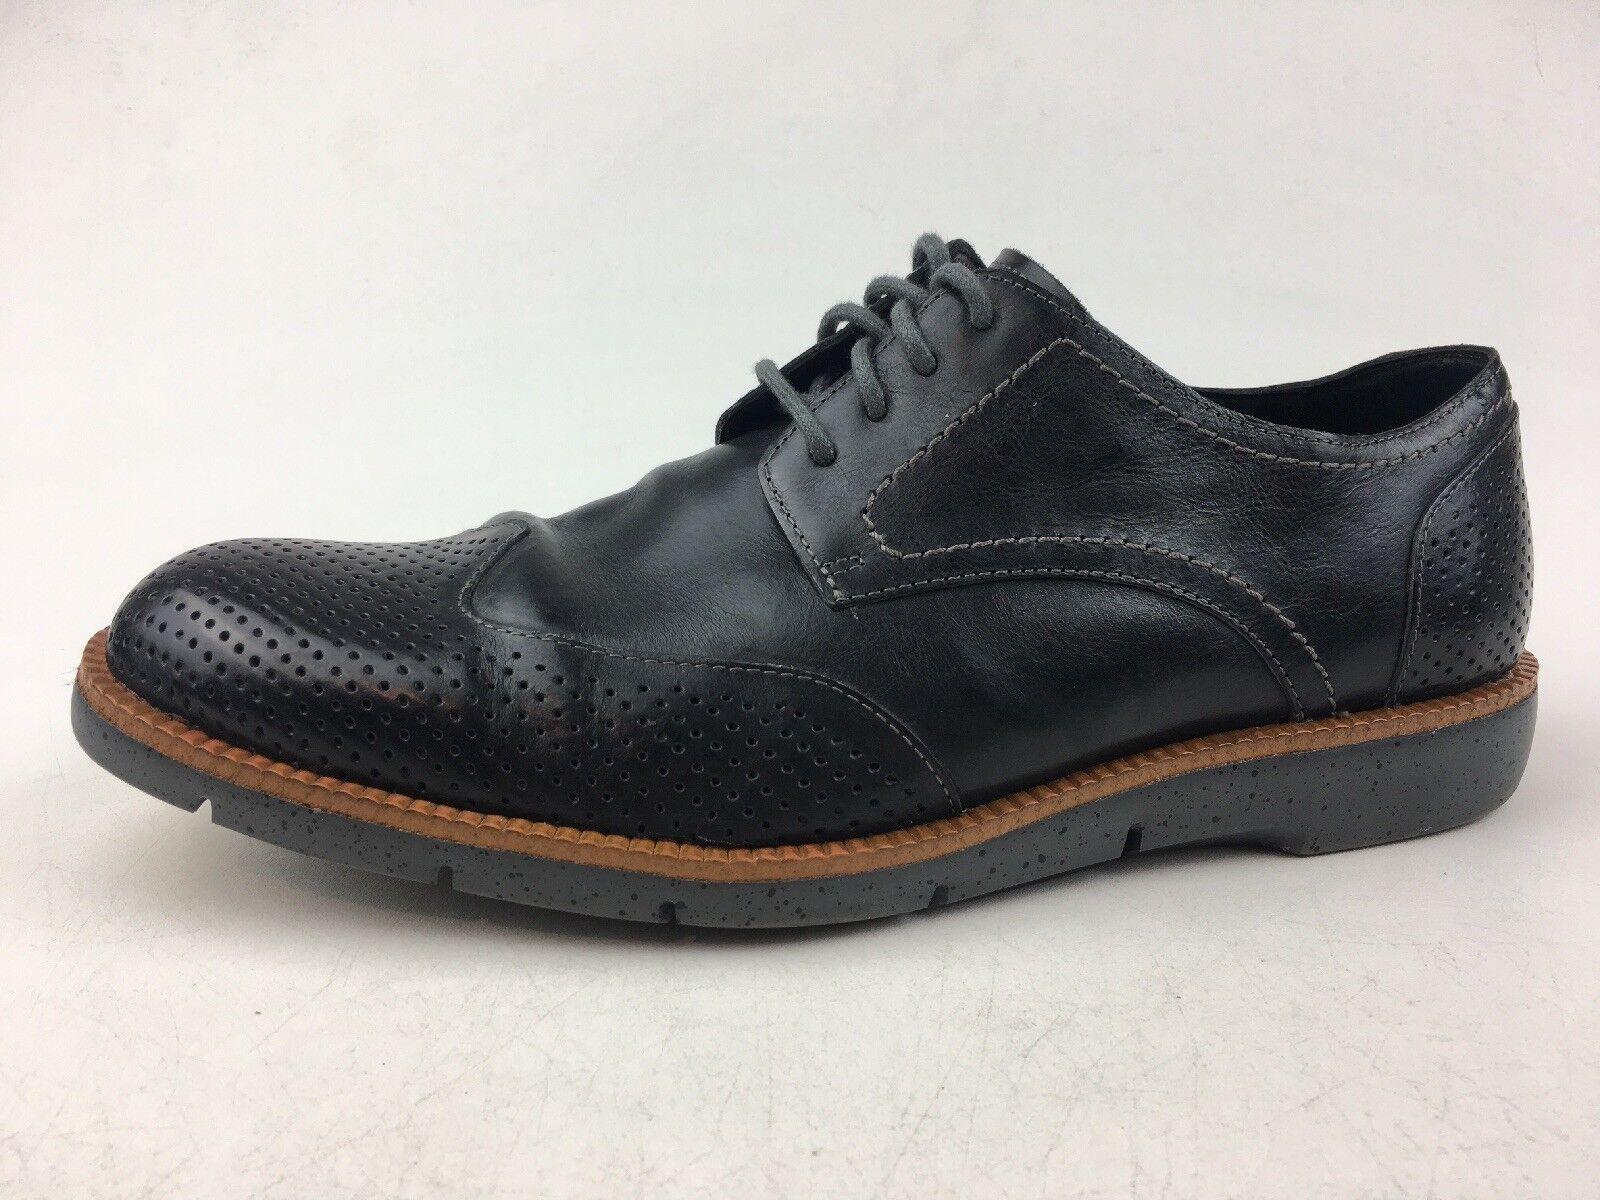 Donald J. Pliner Edd-61 Perforated Wingtip Oxford shoes Size 9M, Black 1246